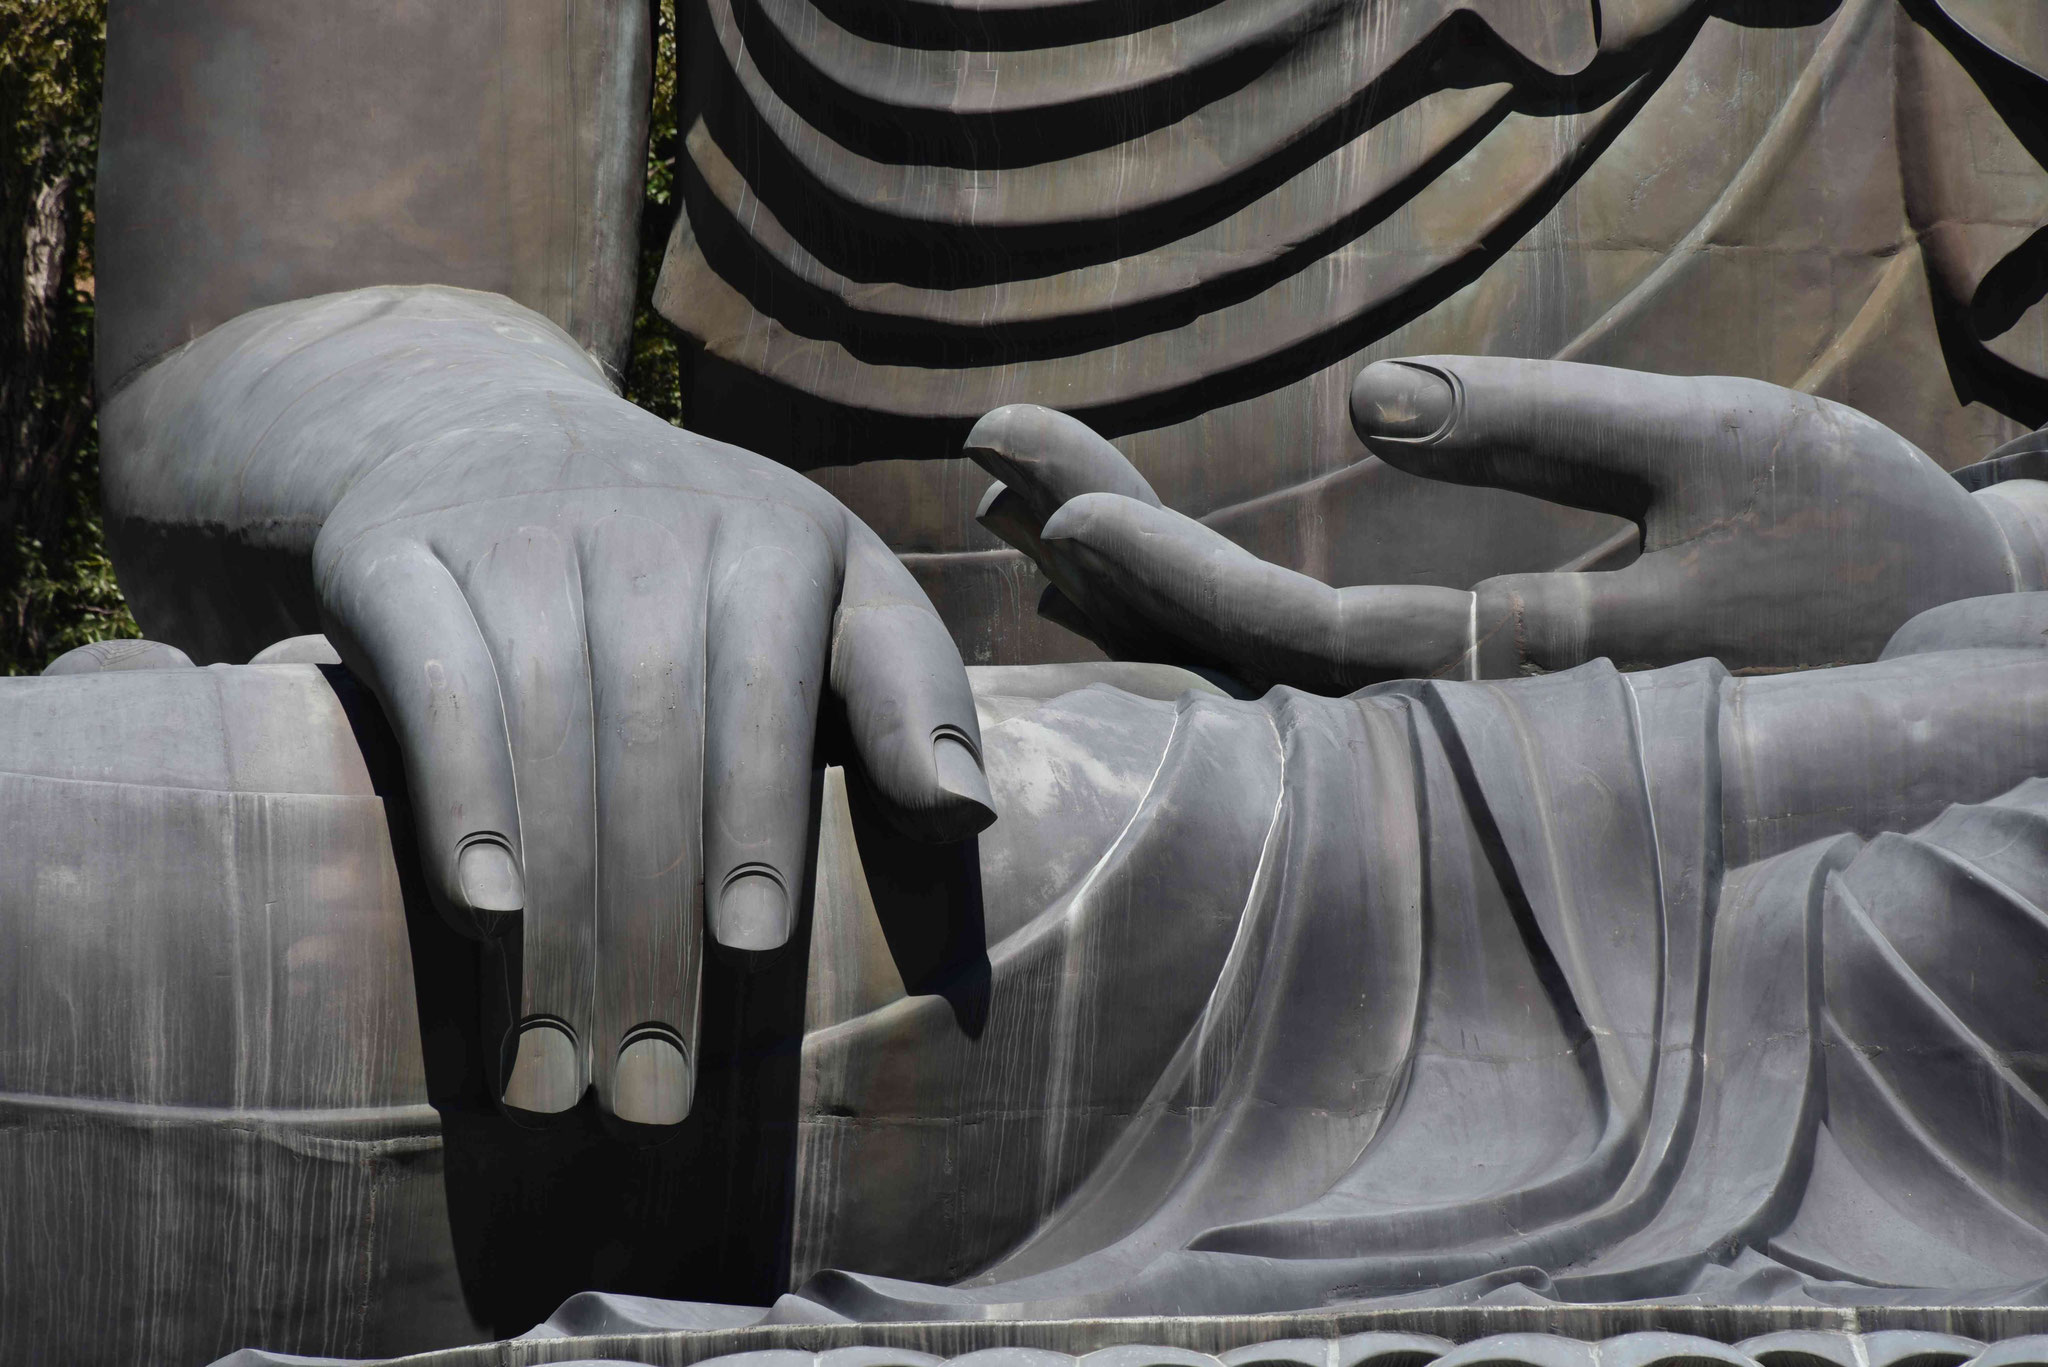 Detailausschnitt der Statue